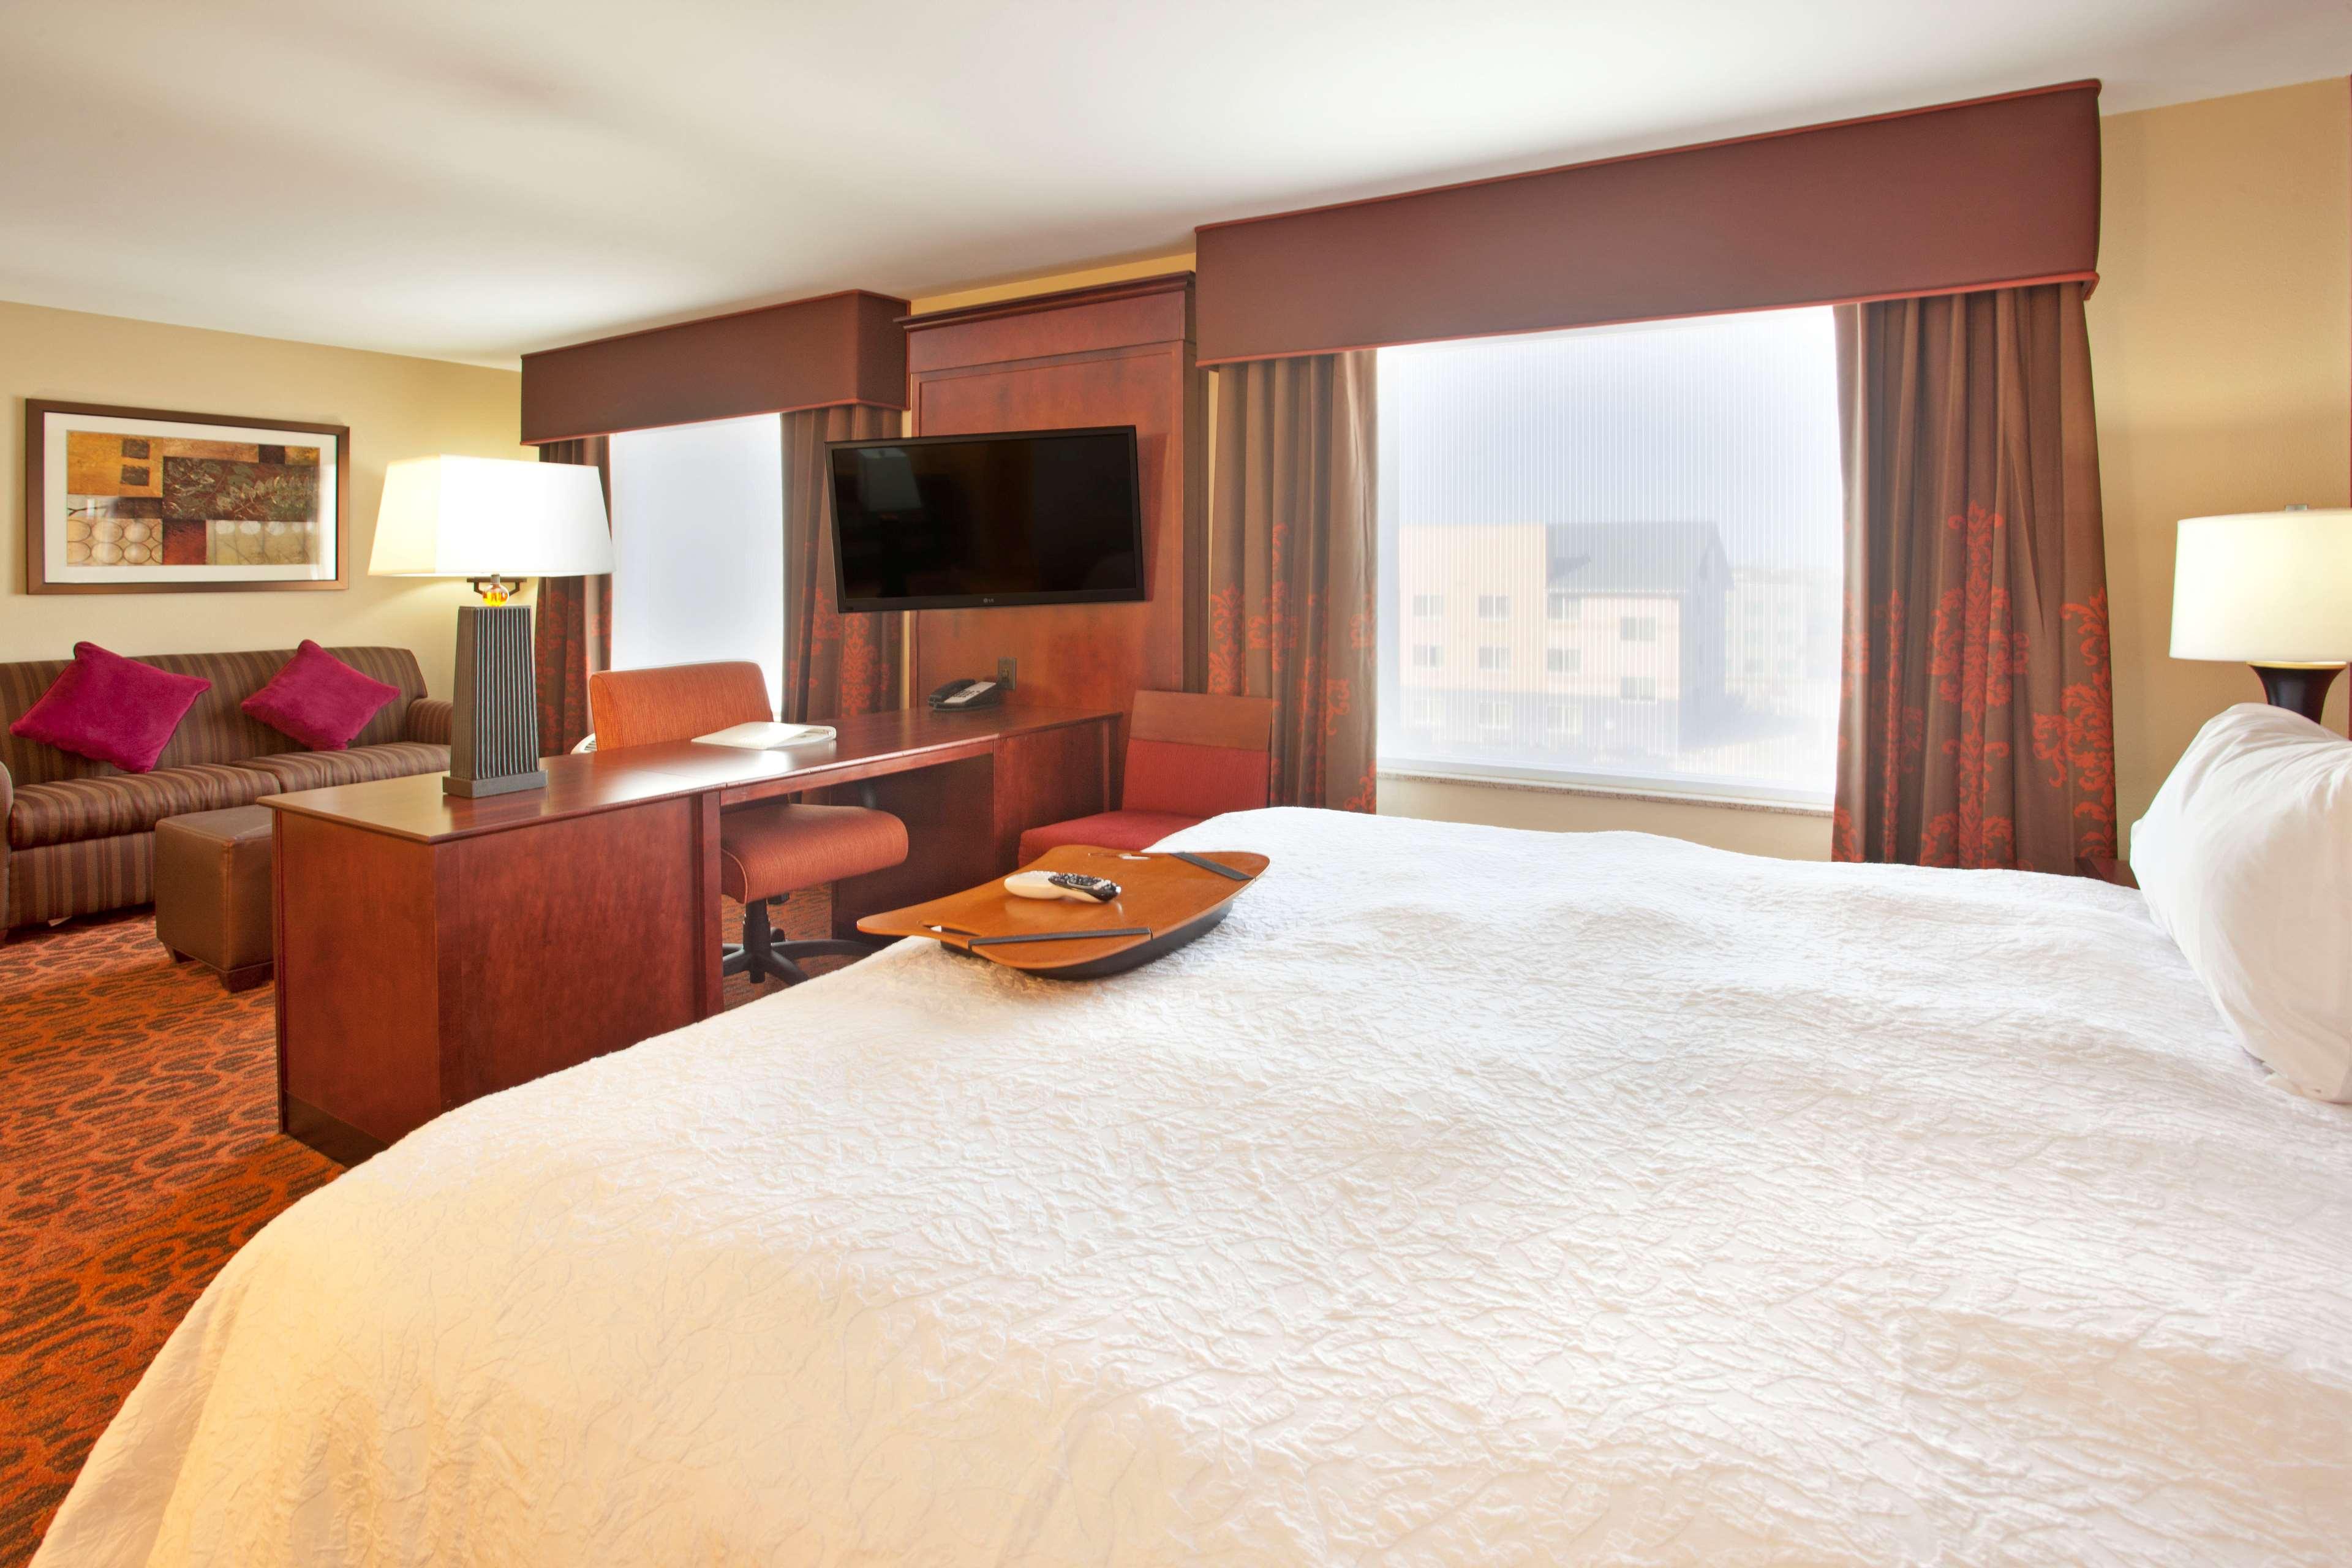 Hampton Inn & Suites Fort Worth-West-I-30 image 20